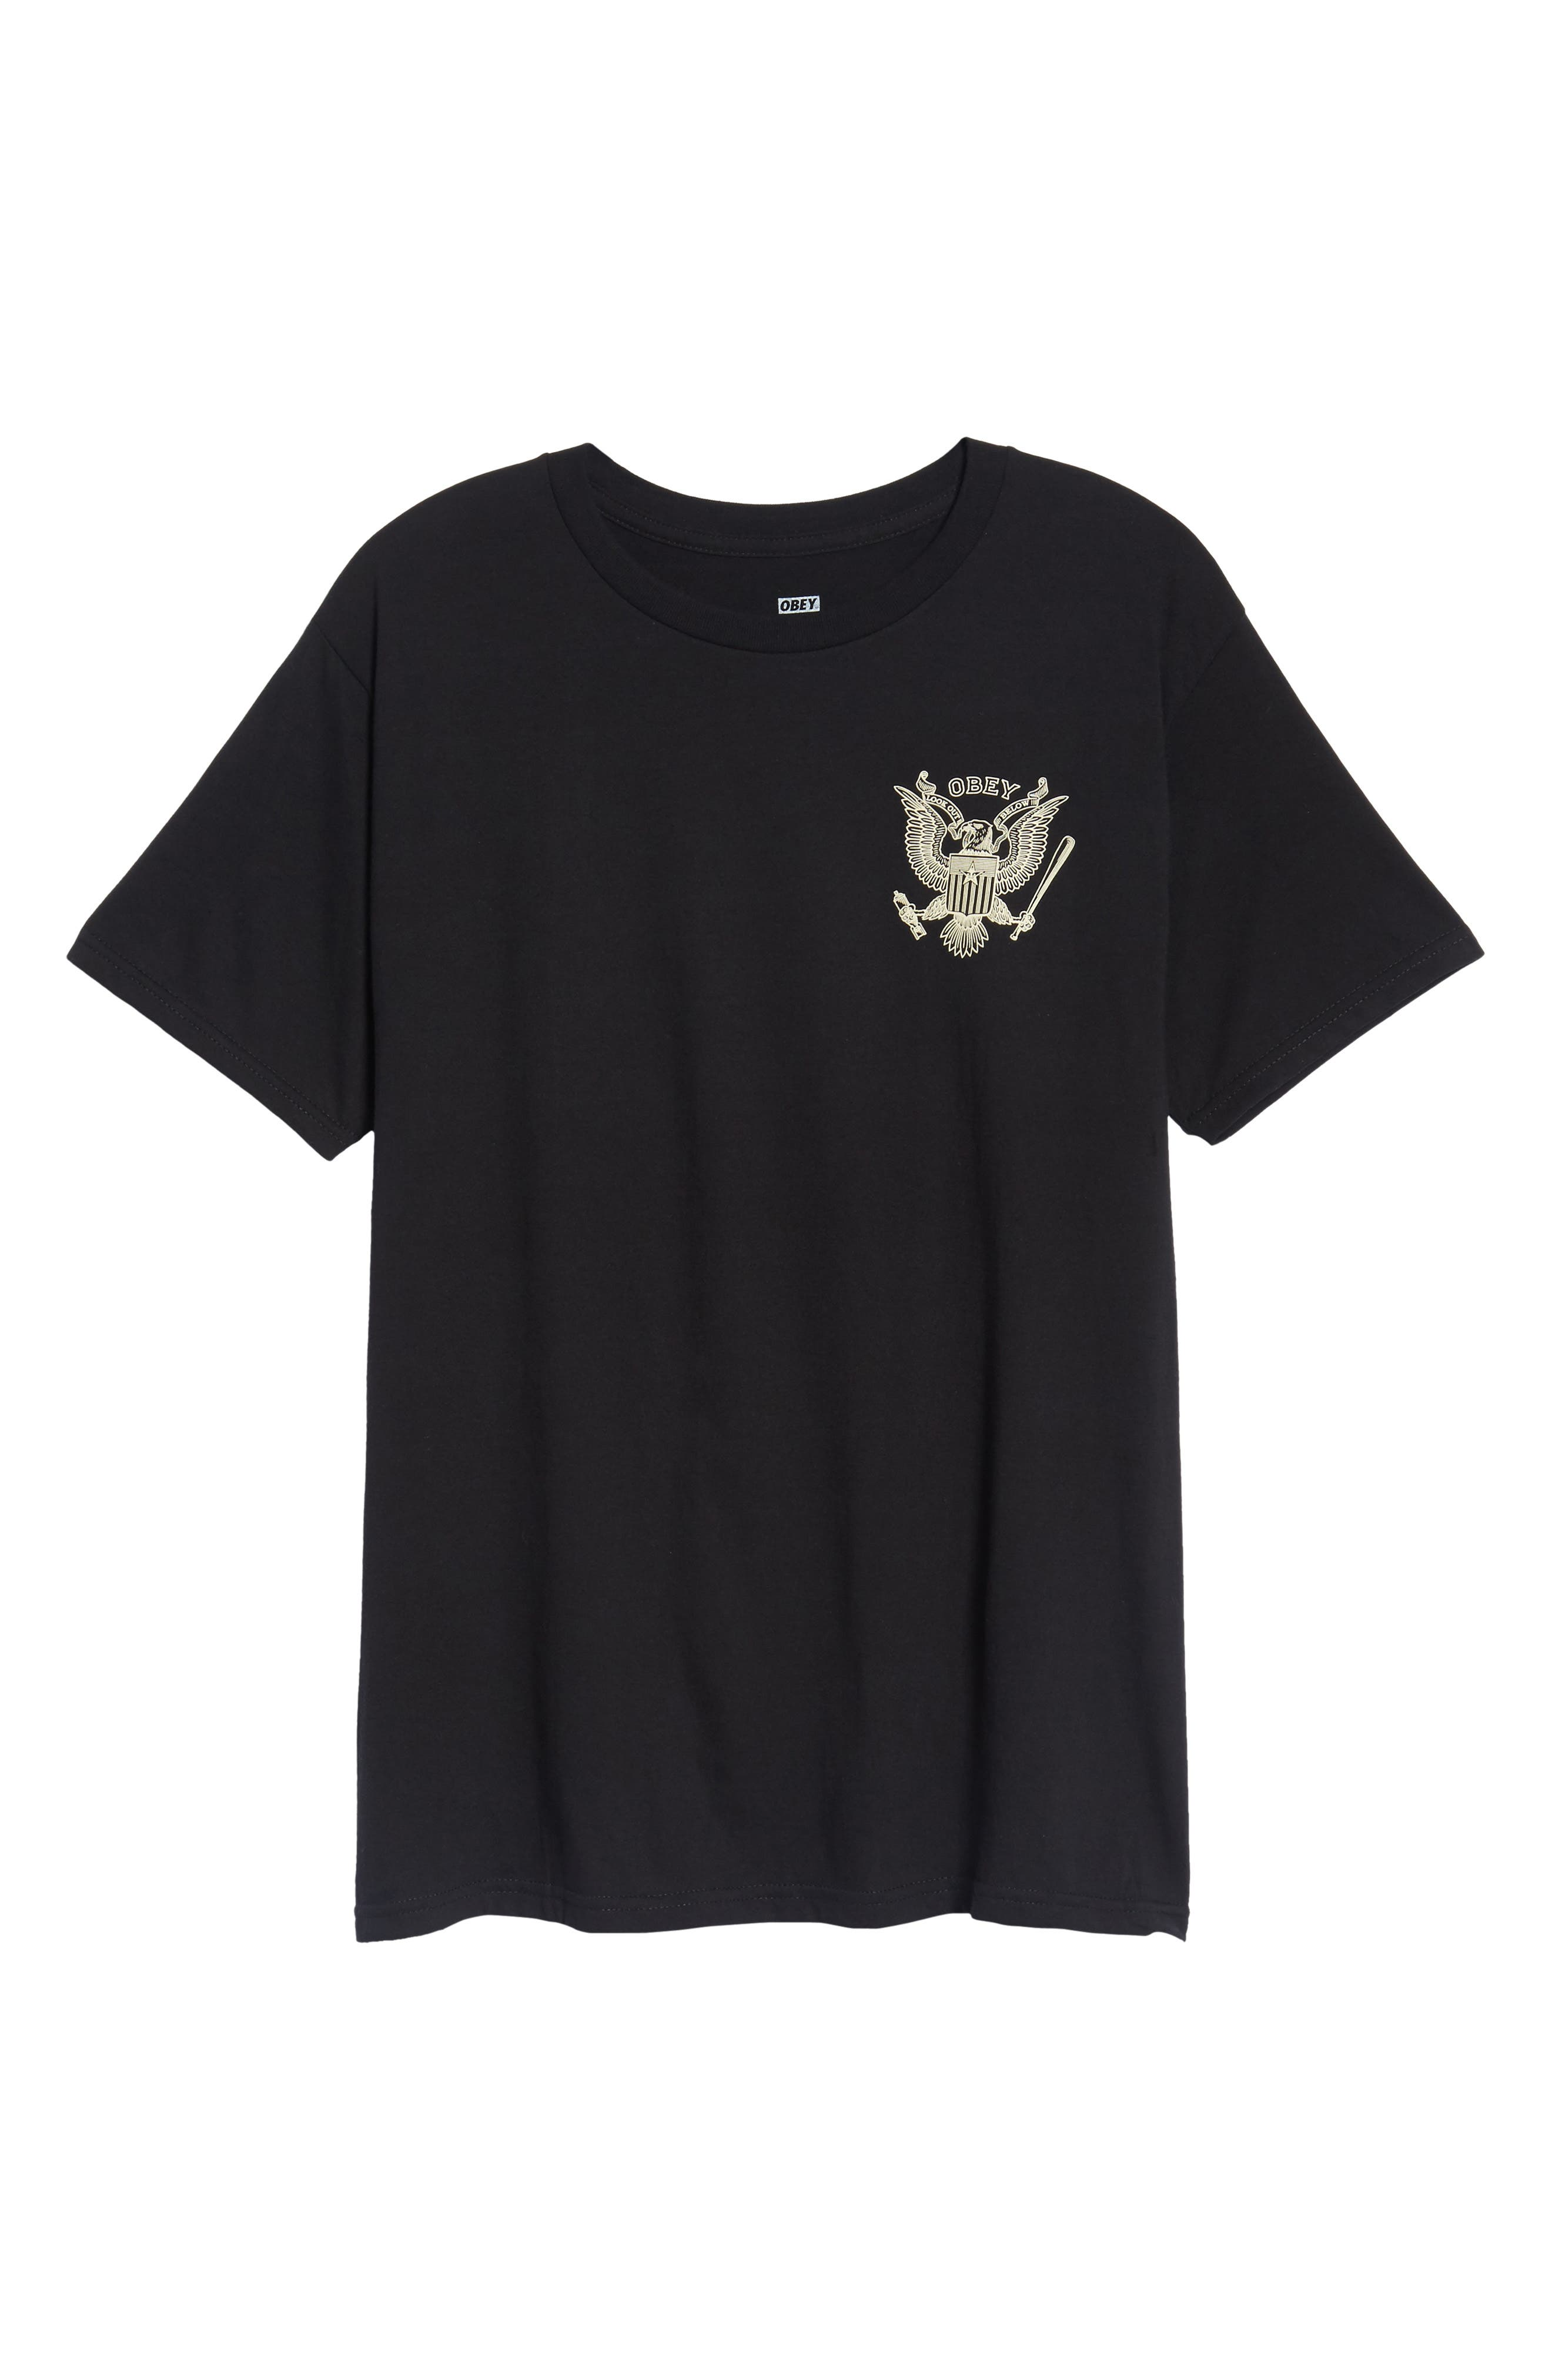 Look Out Below Premium Graphic T-Shirt,                             Alternate thumbnail 6, color,                             Black